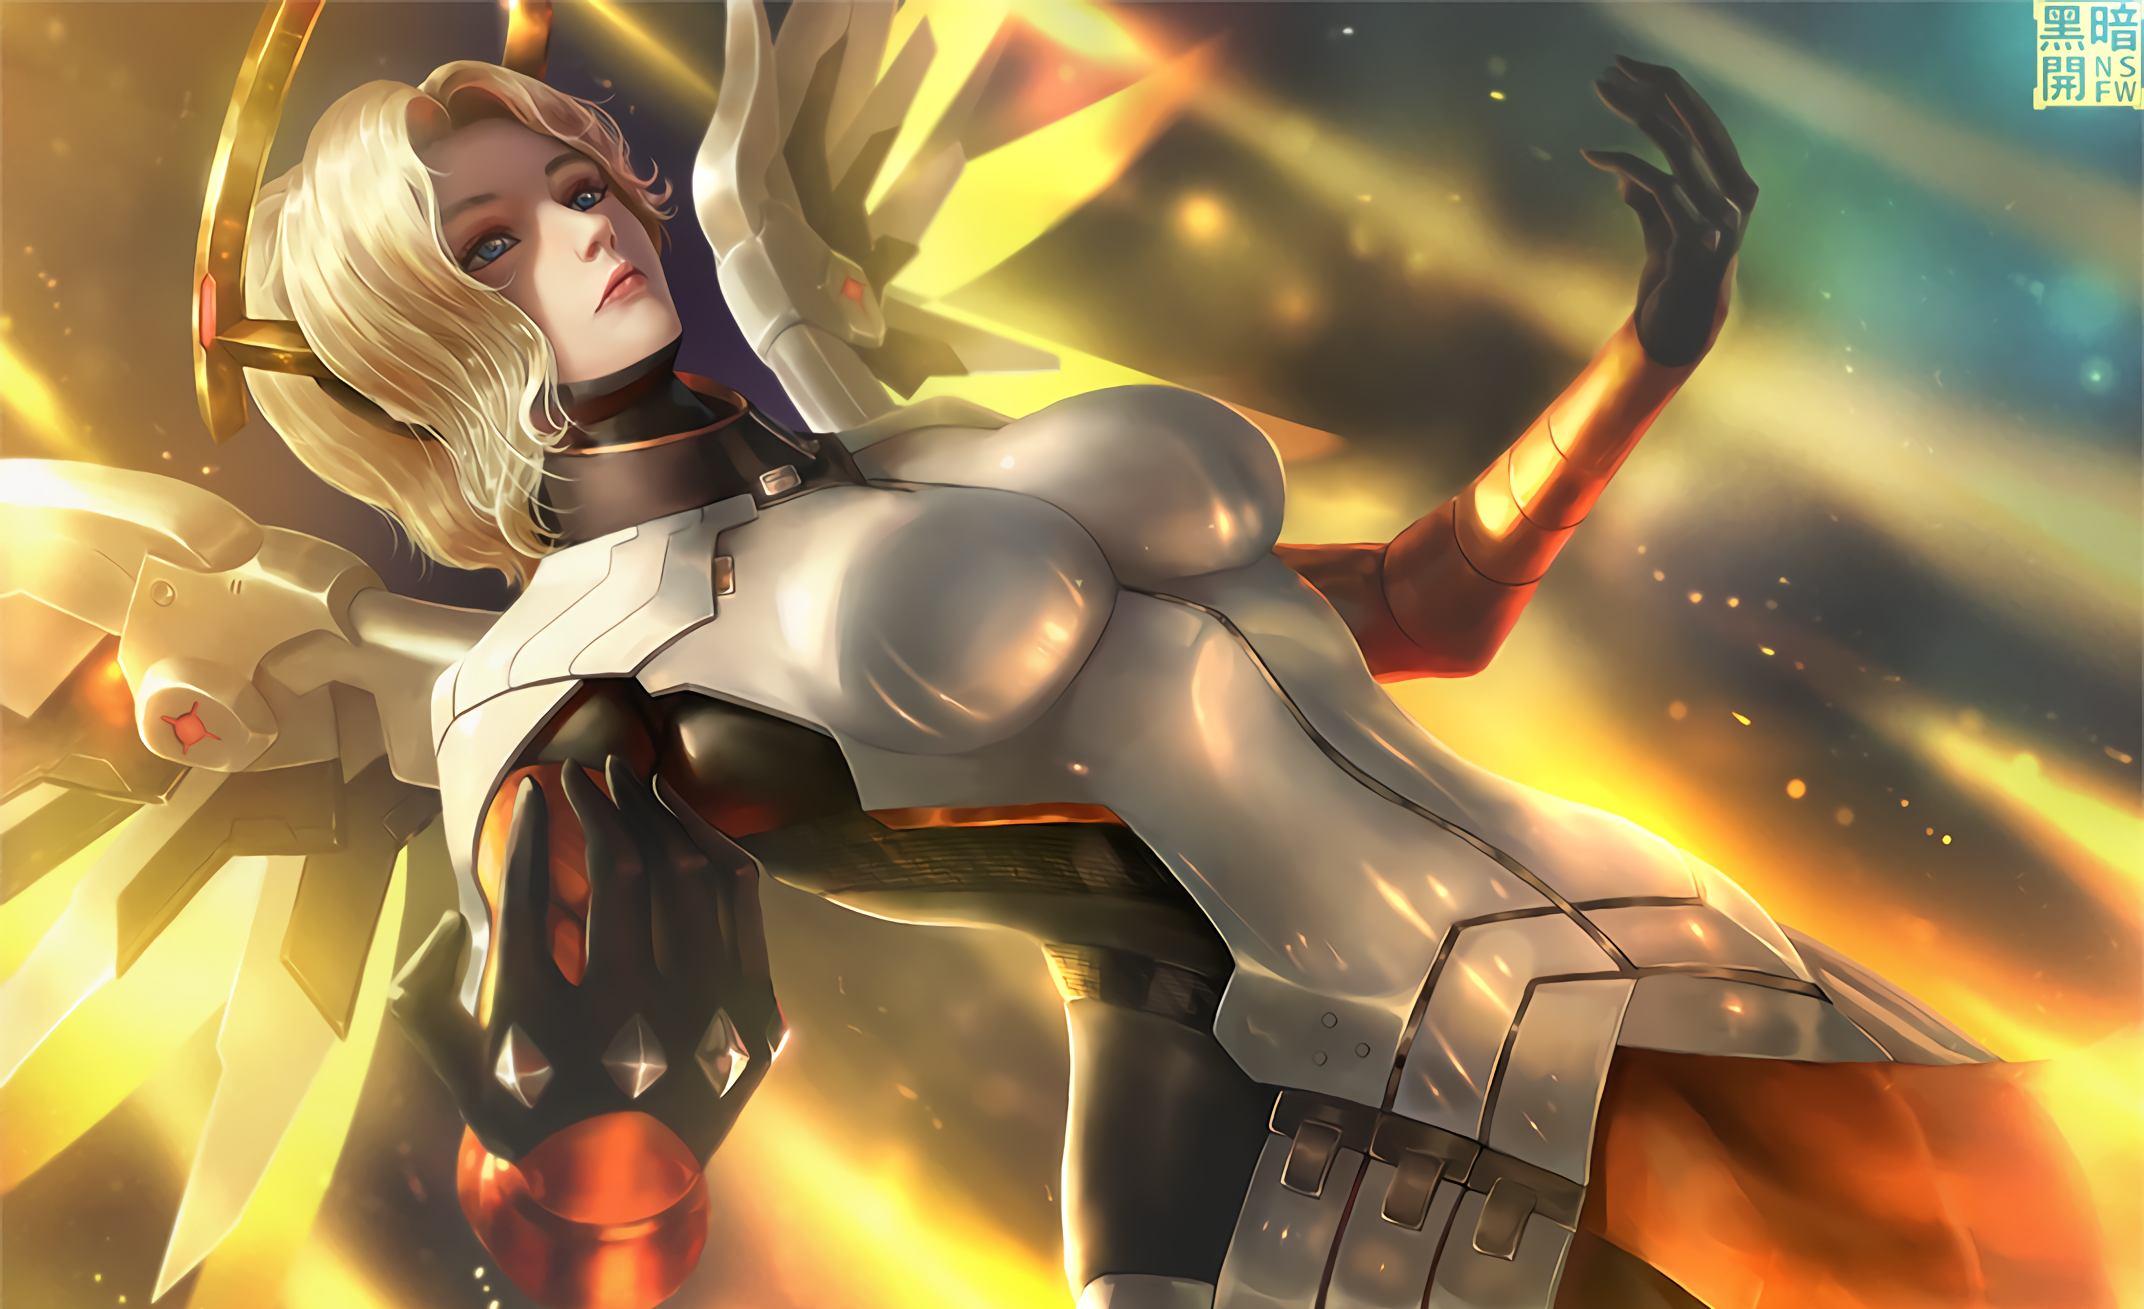 Beautiful Angel Girl Mercy Overwatch Game Wallpaper Artist